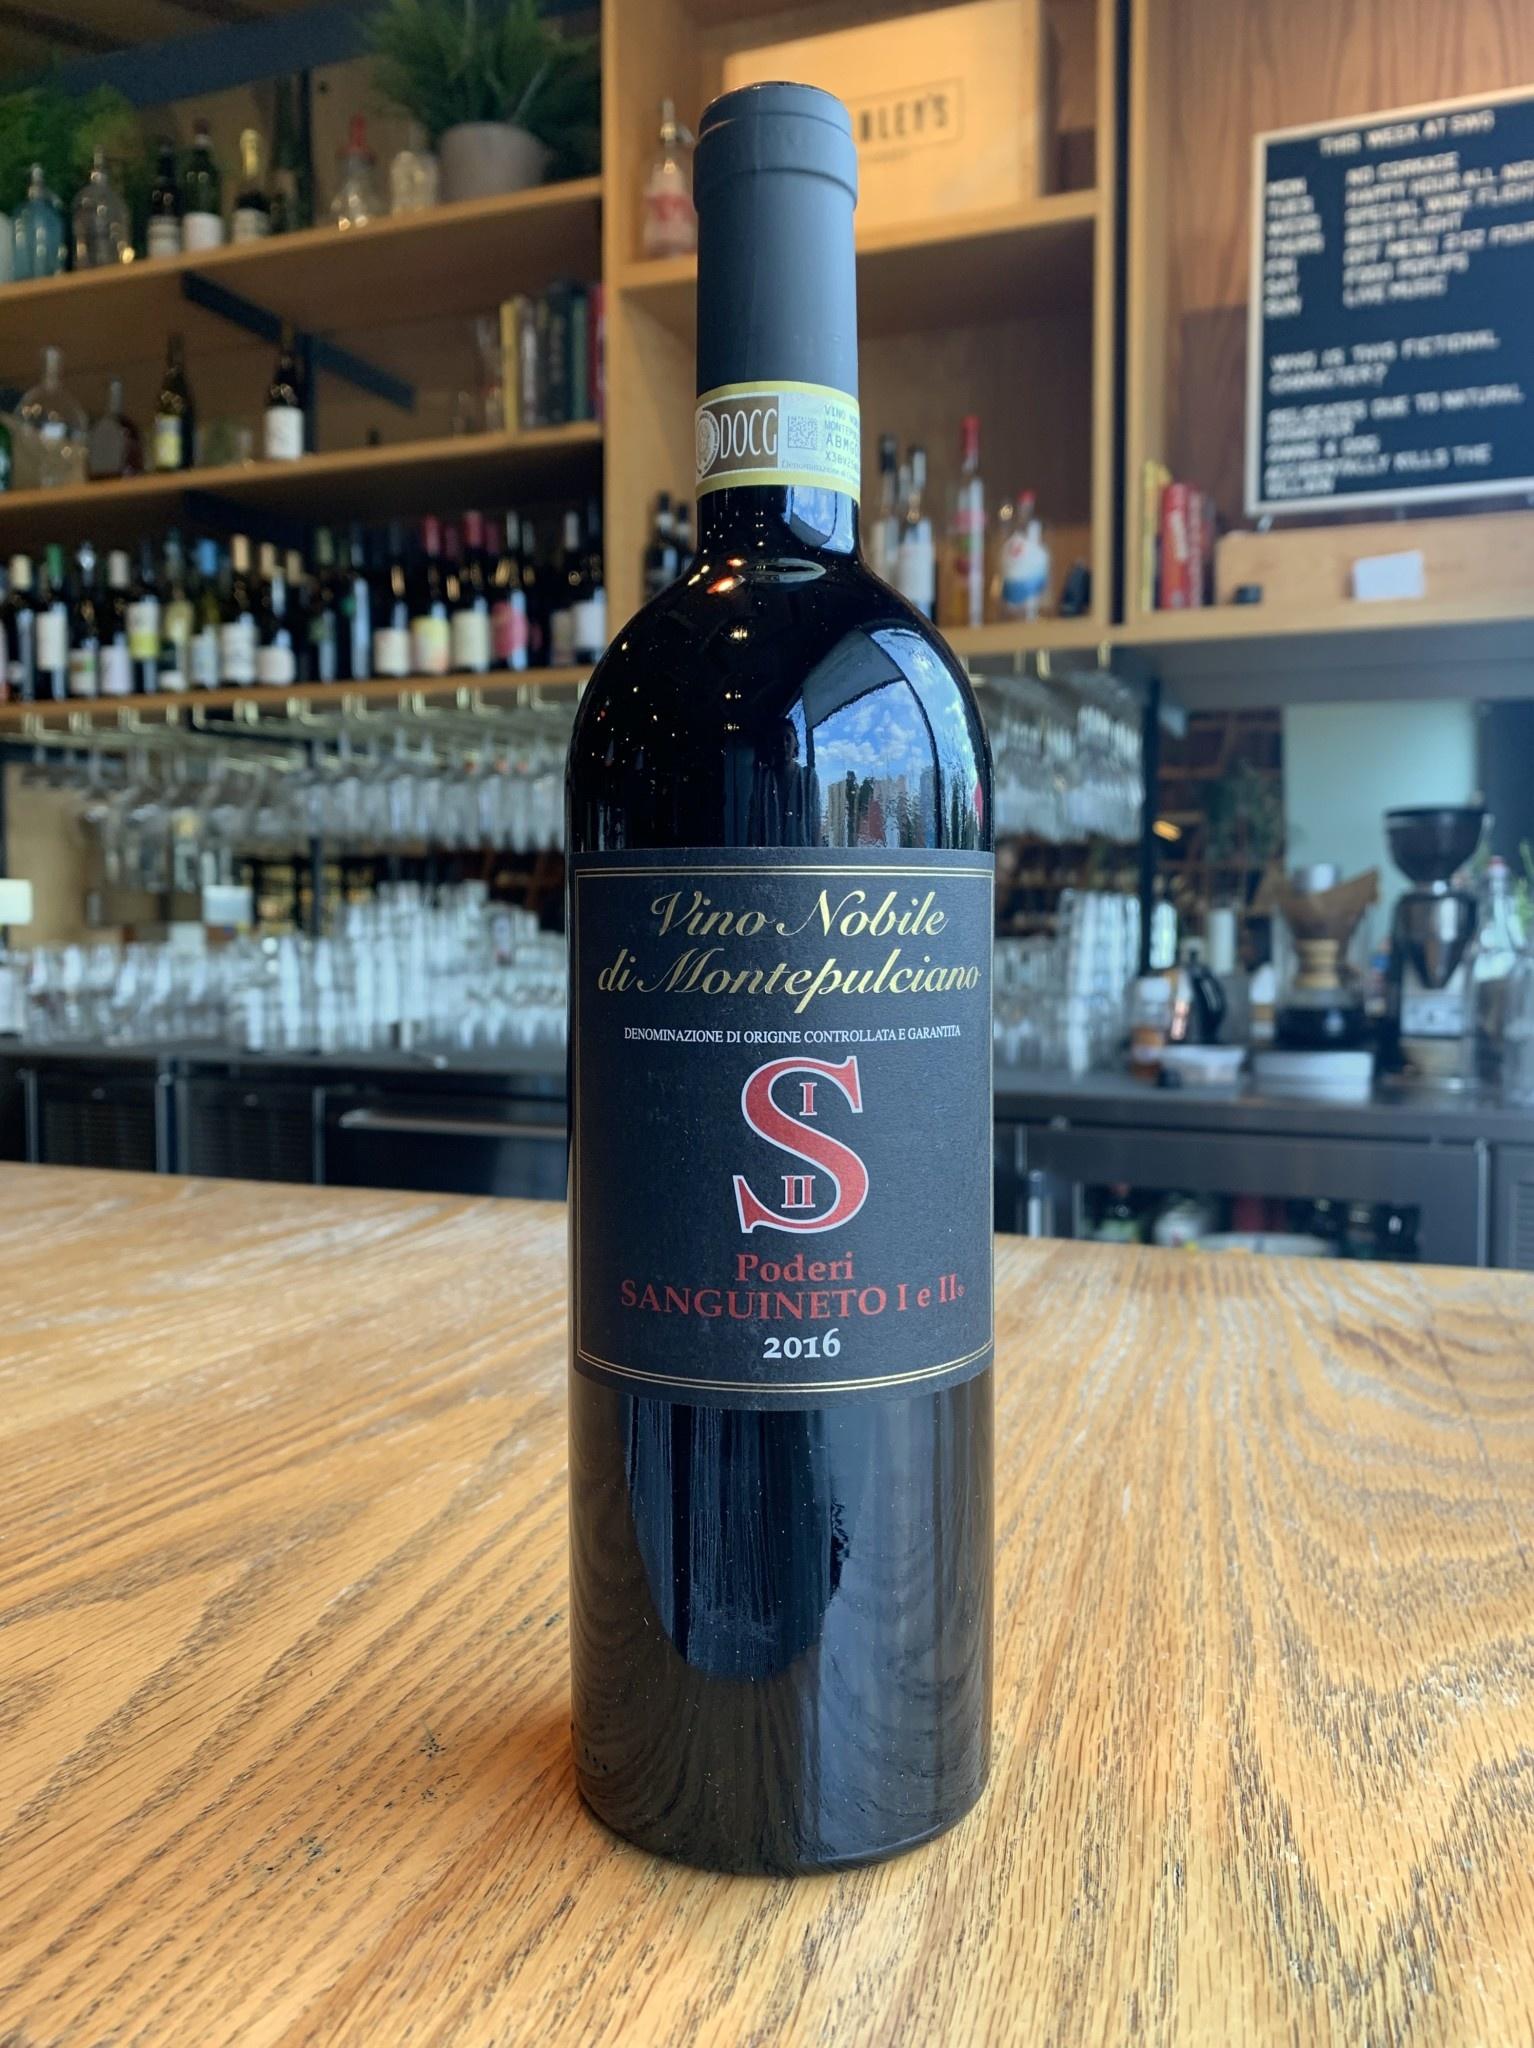 Poderi Sanguineto I e II 2016 Poderi Sanguineto I e II Vino Nobile di Montepulciano 750ml